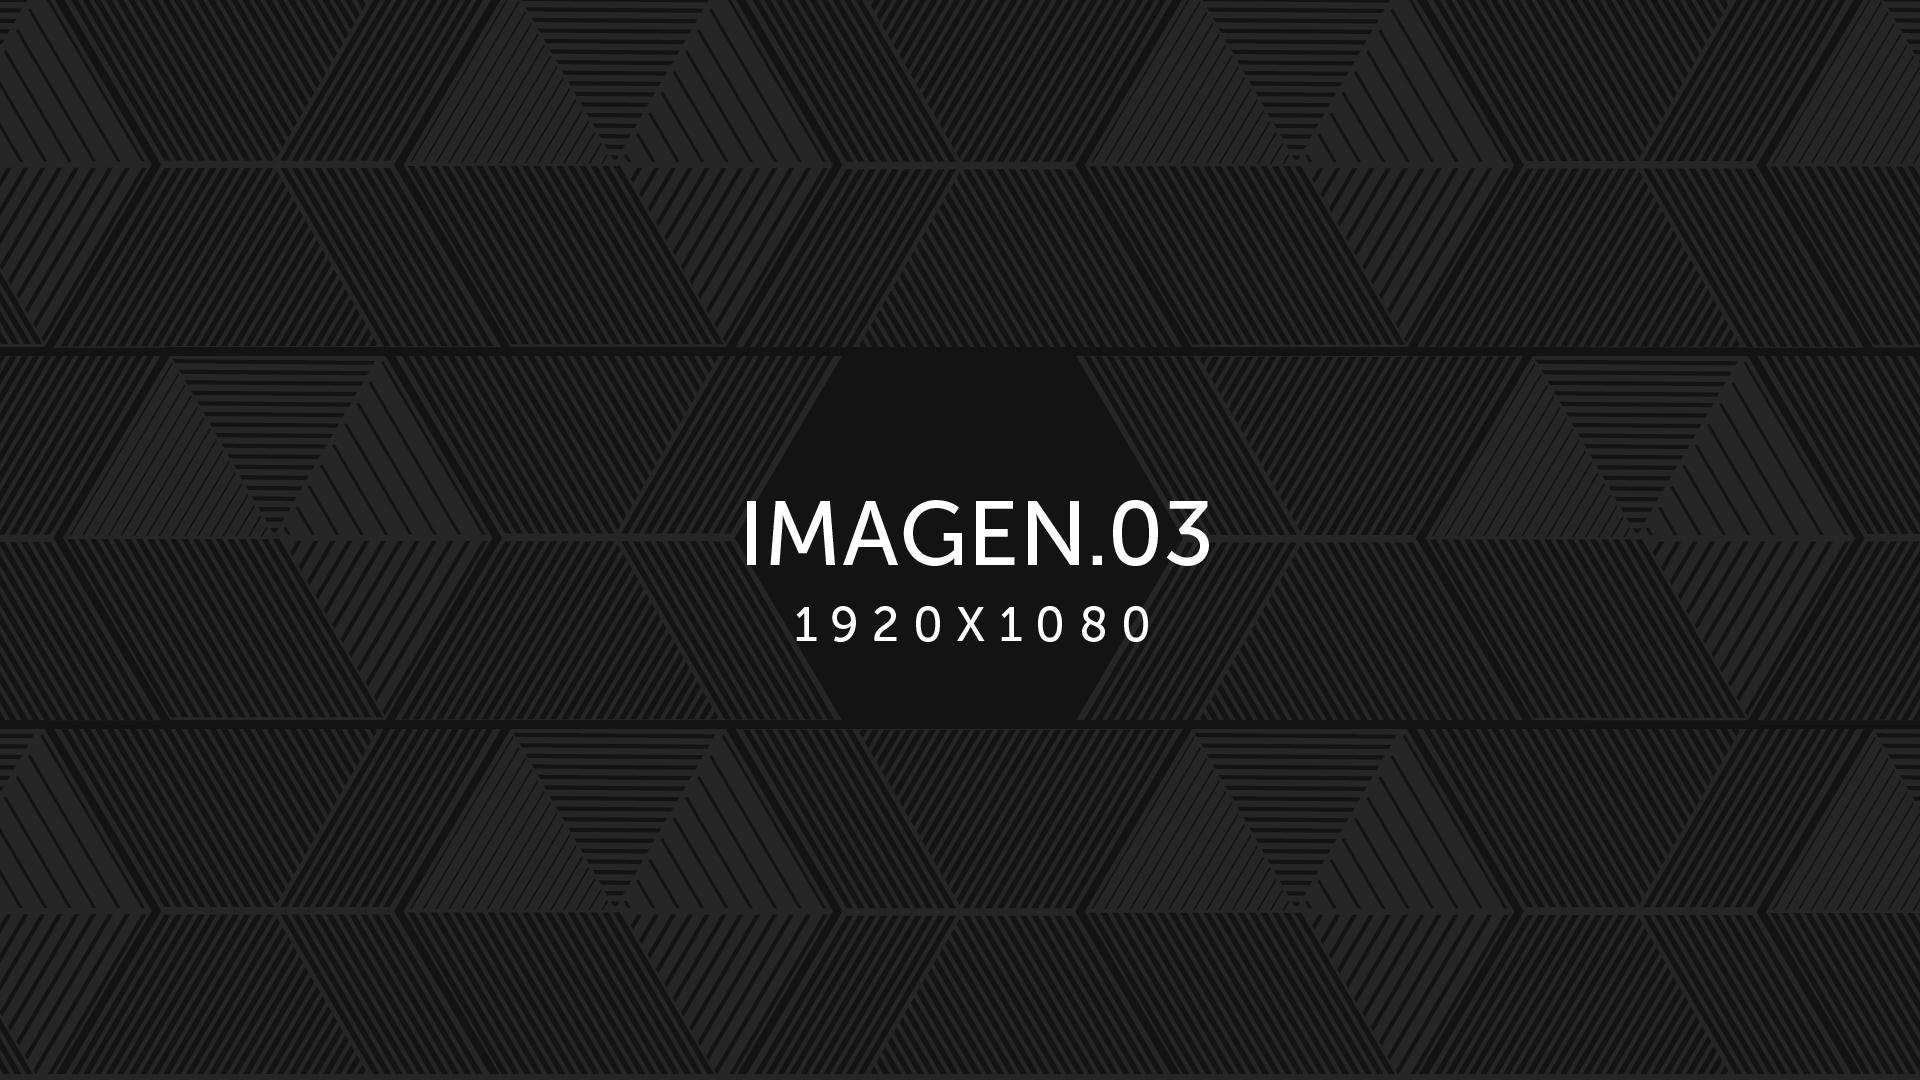 PB_Imagen03_1920x1080.jpg